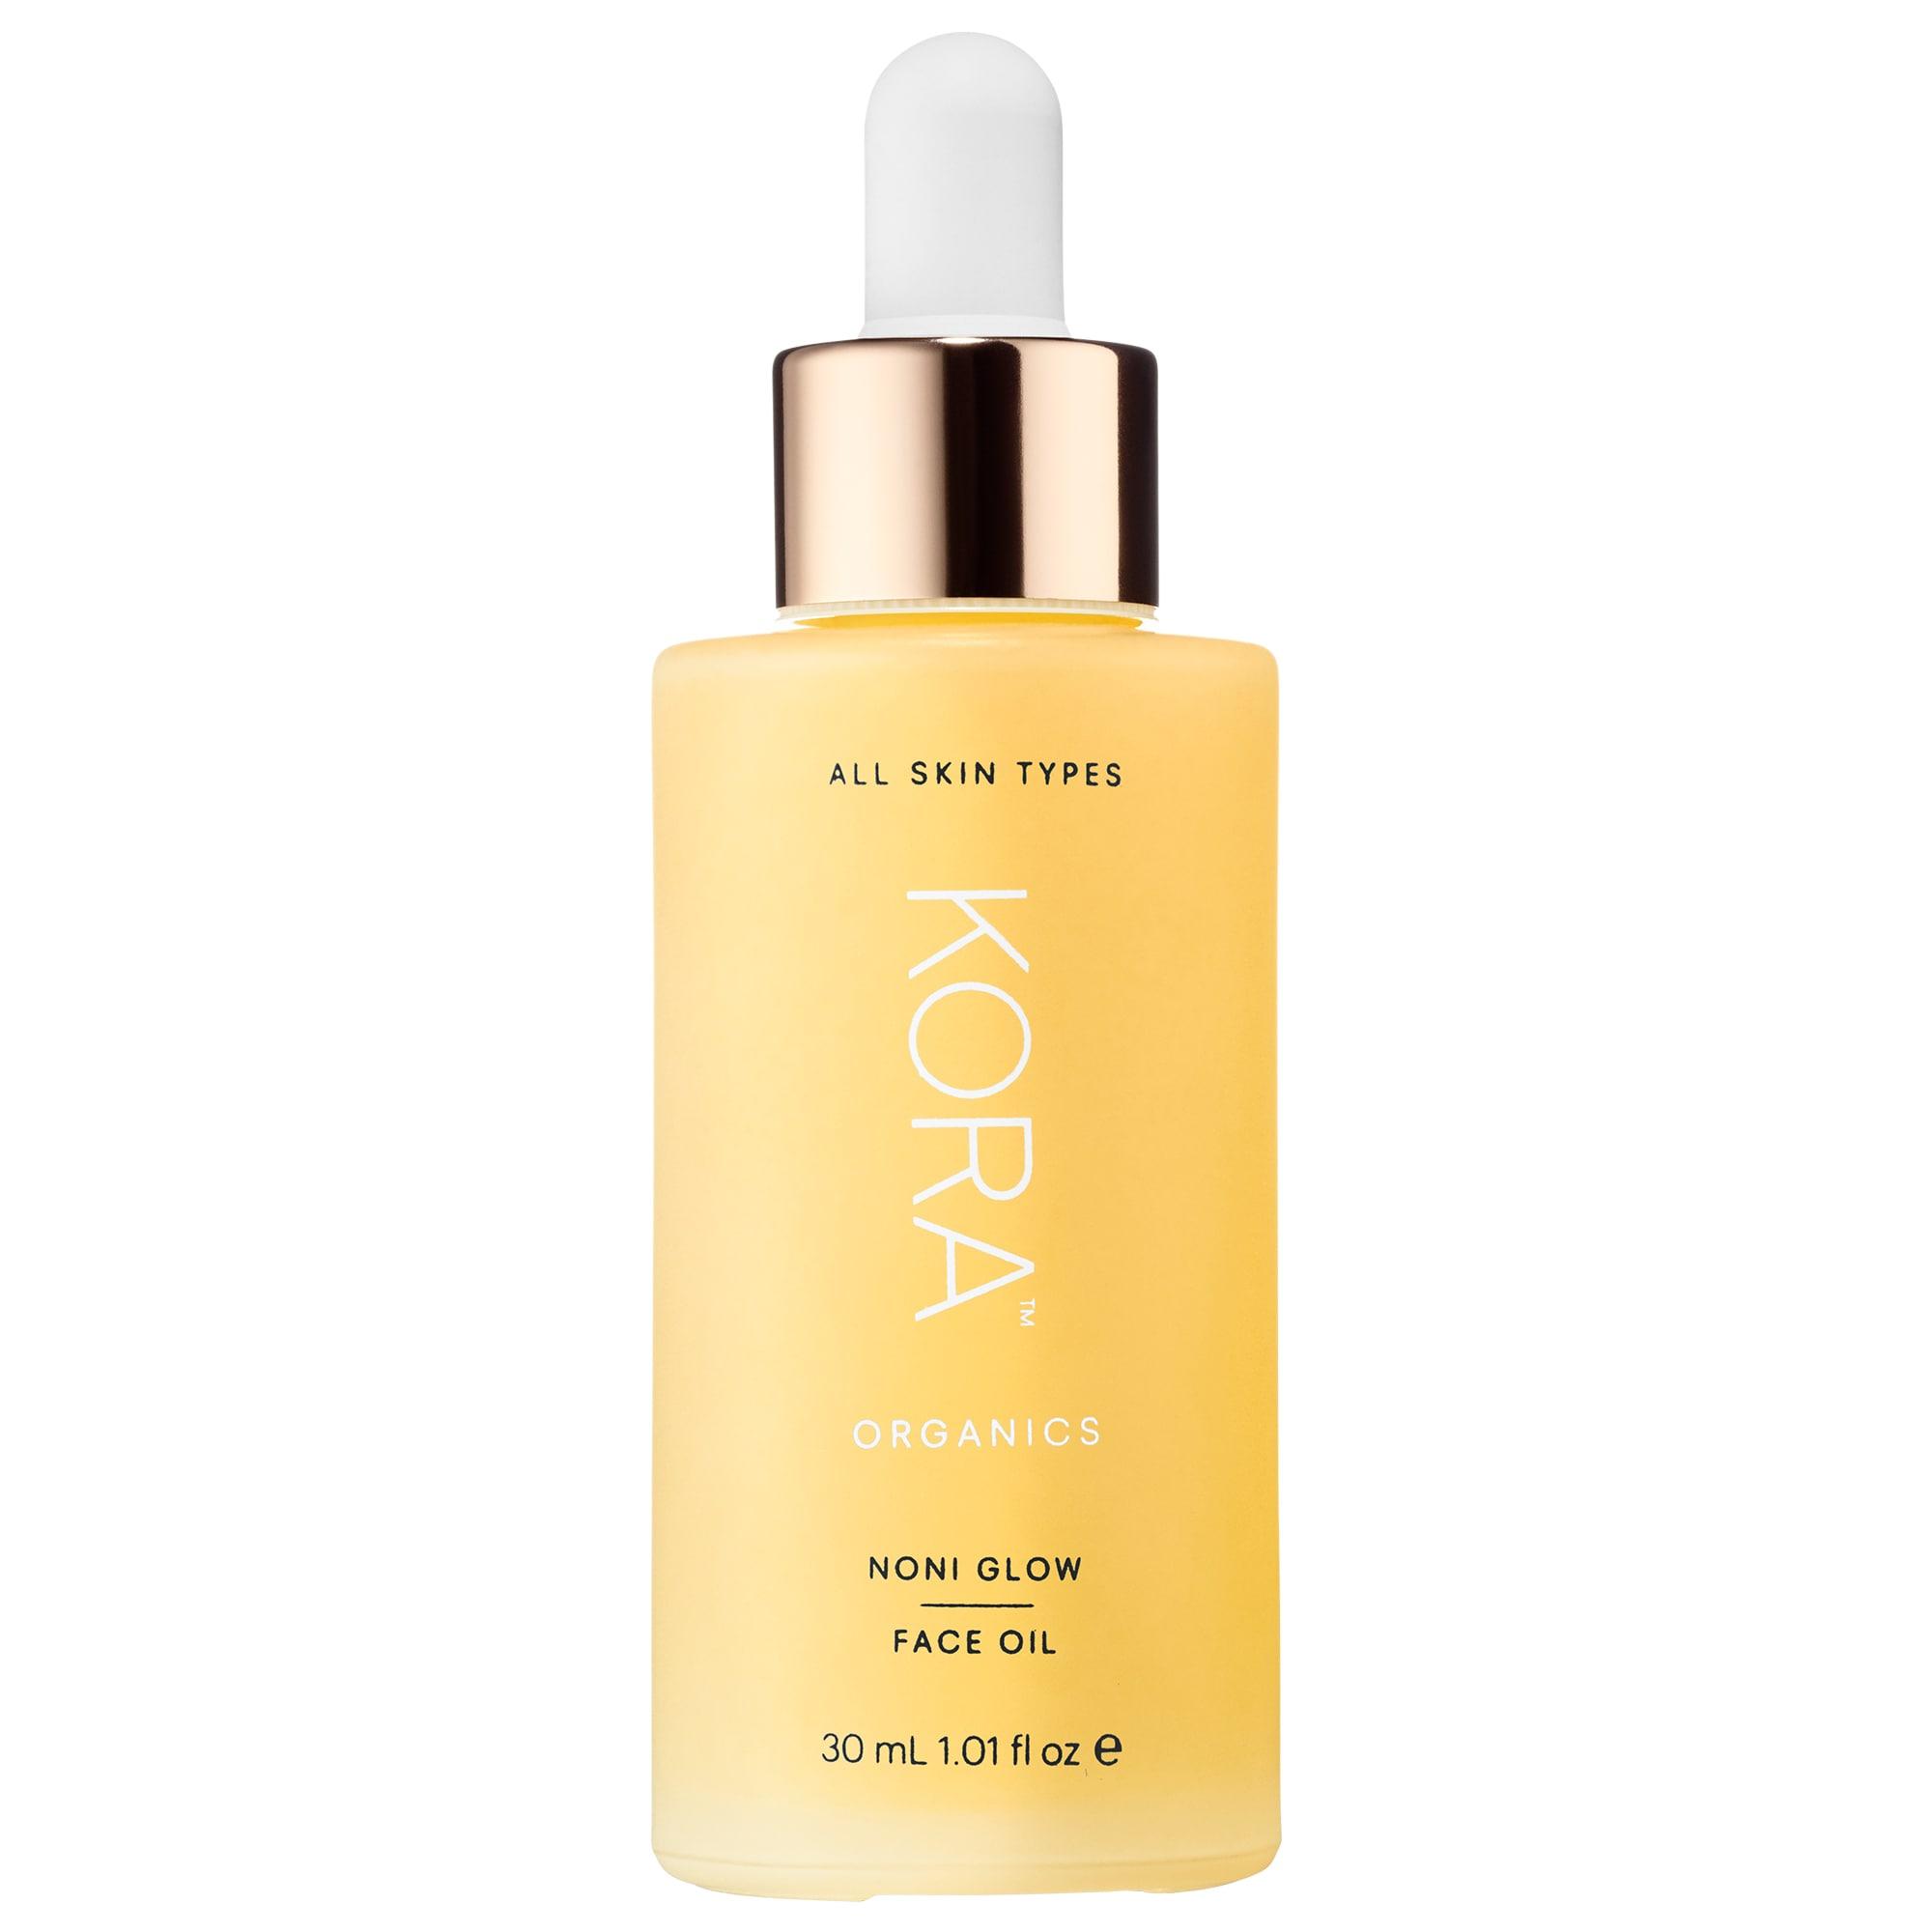 Kora Organics - Noni Glow Face Oil